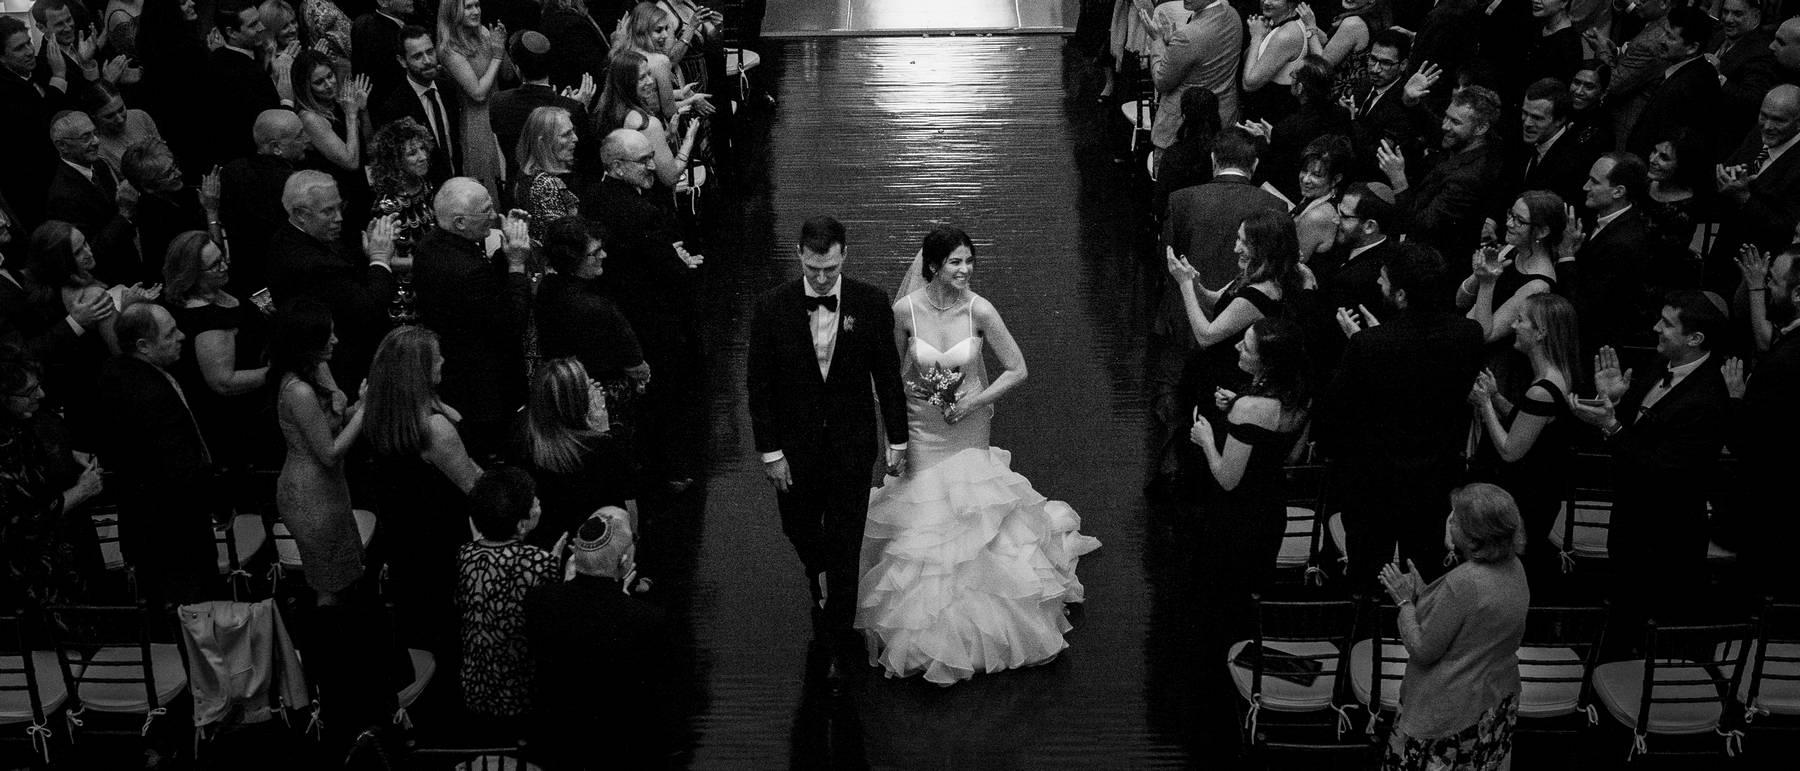 johnandjoseph-wedding-photographer-hz-slider-297